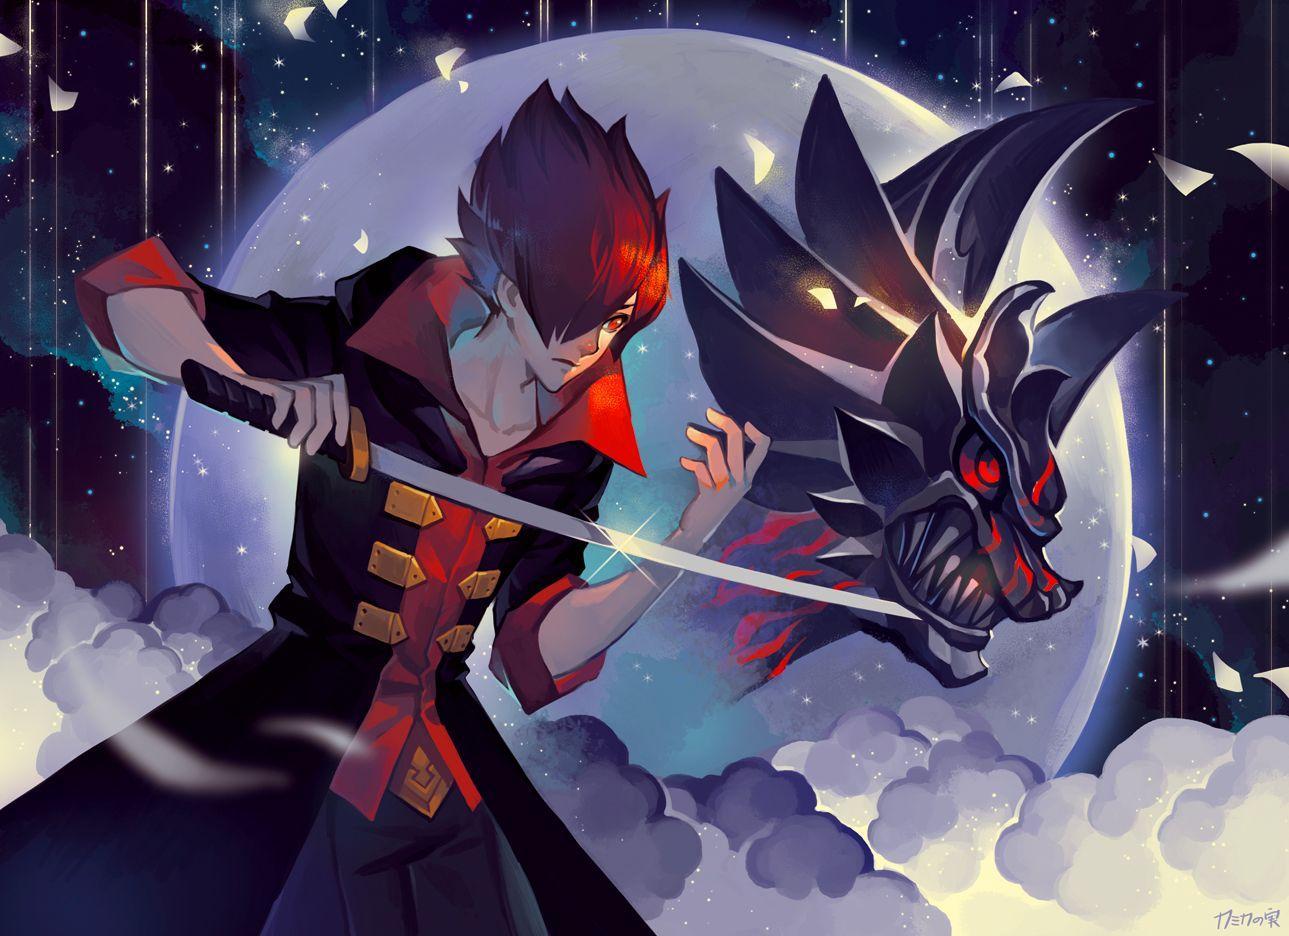 Garo Anime Wallpapers Top Free Garo Anime Backgrounds